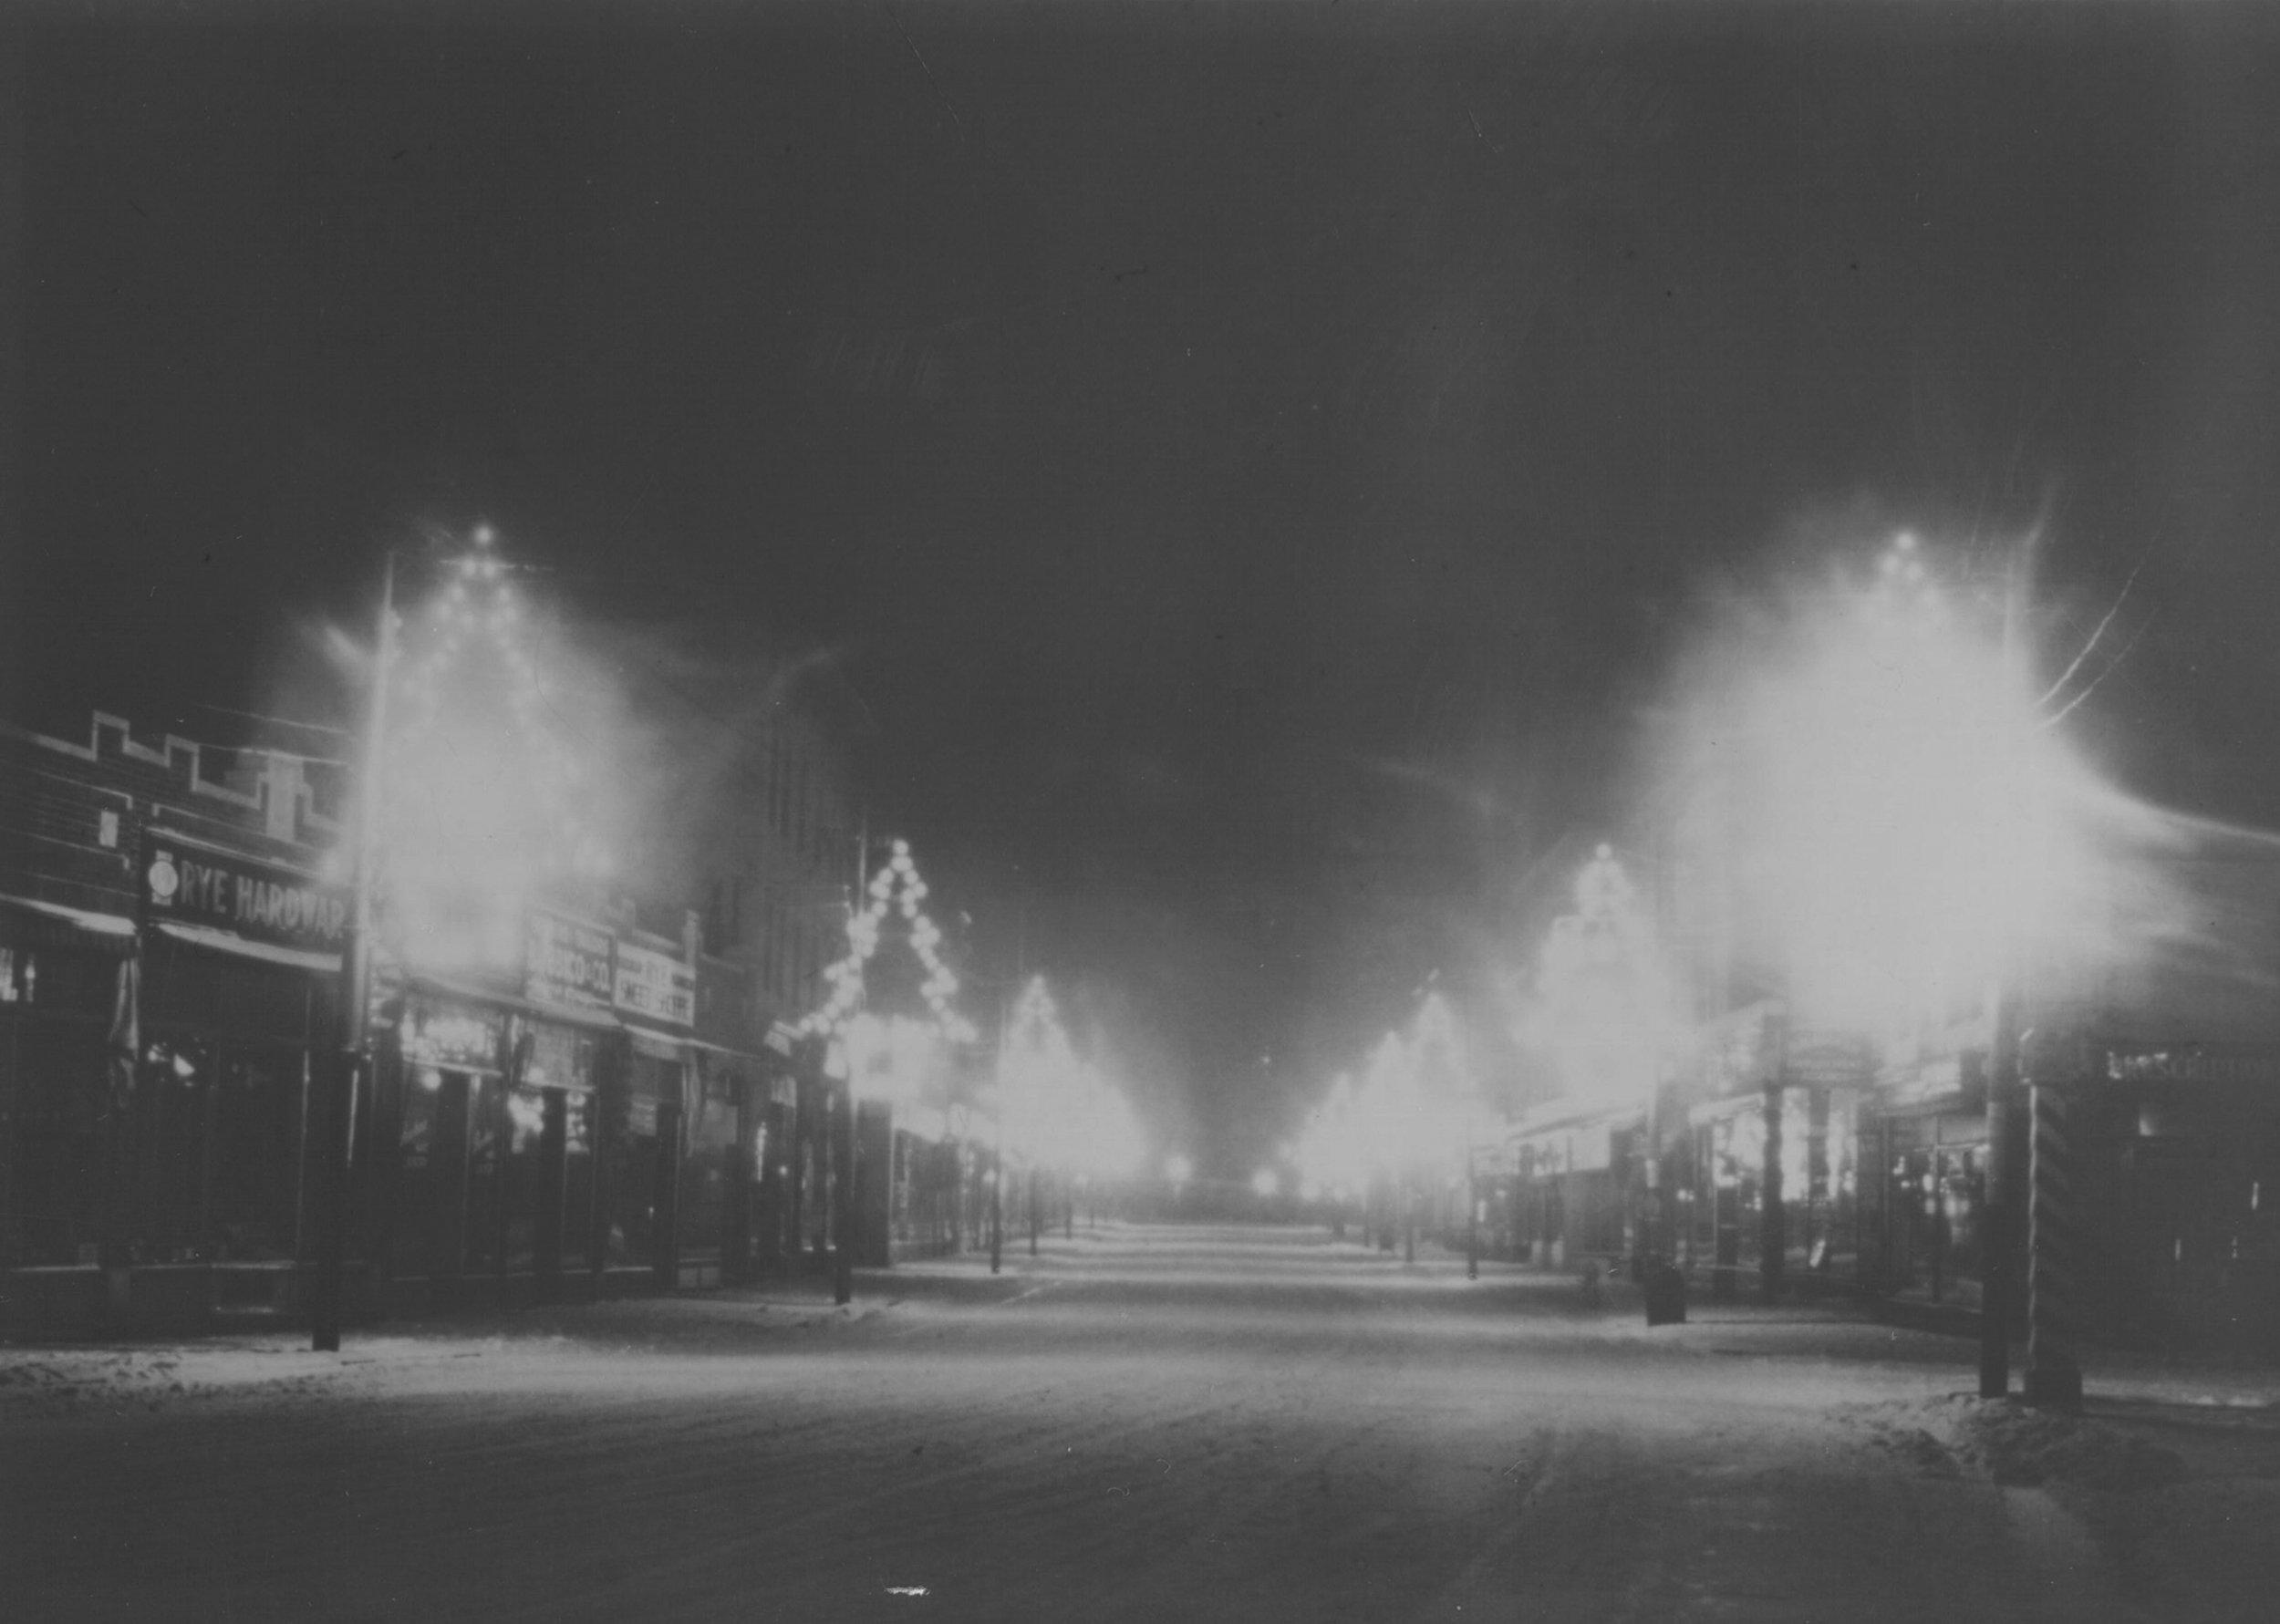 Christmas Lights on Purchase Street